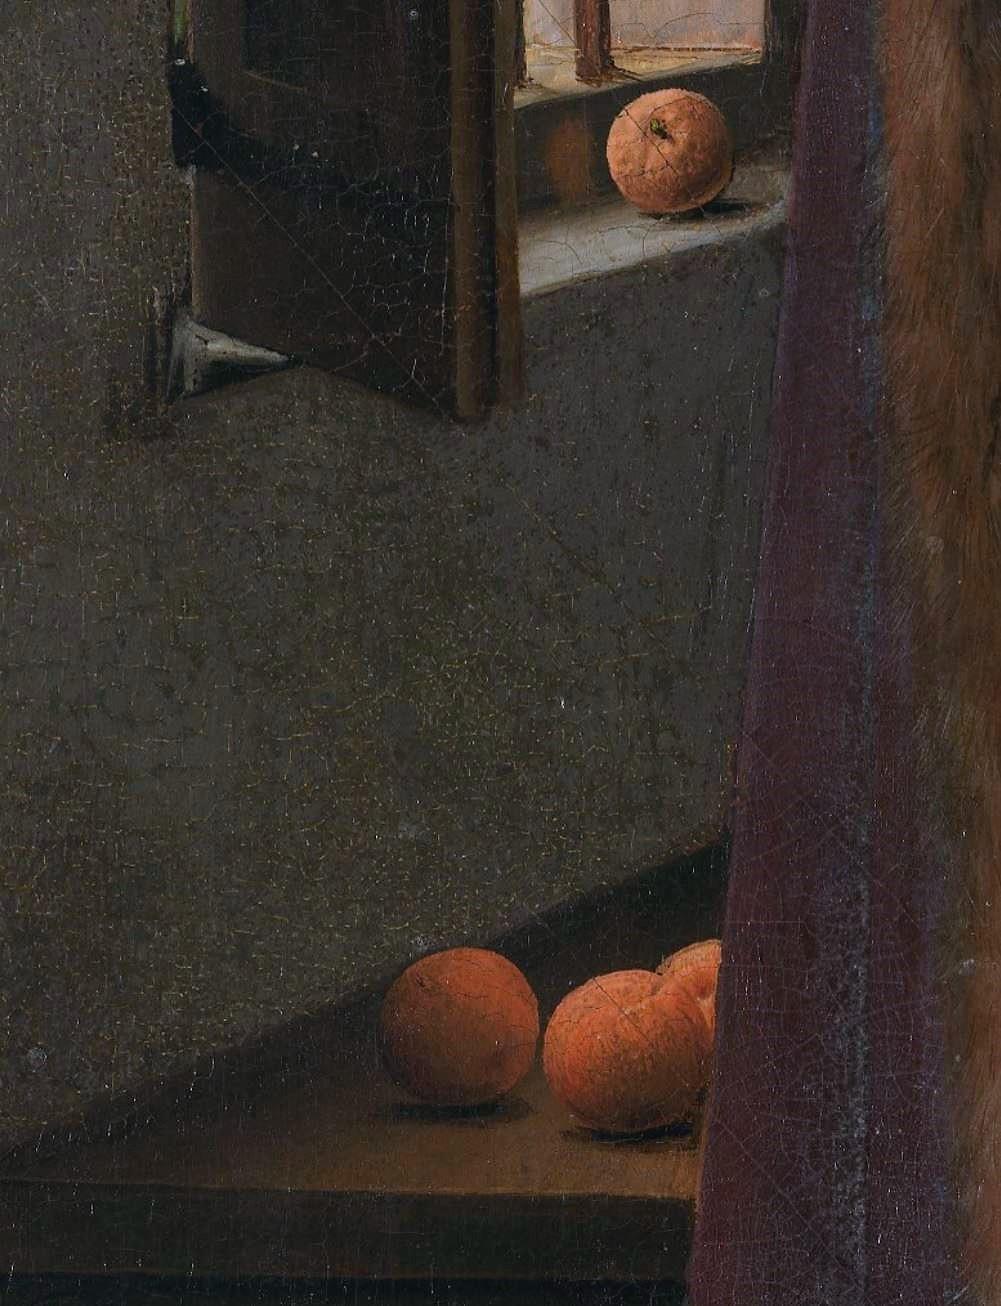 Van_Eyck 1434 _Arnolfini_Portrait oranges